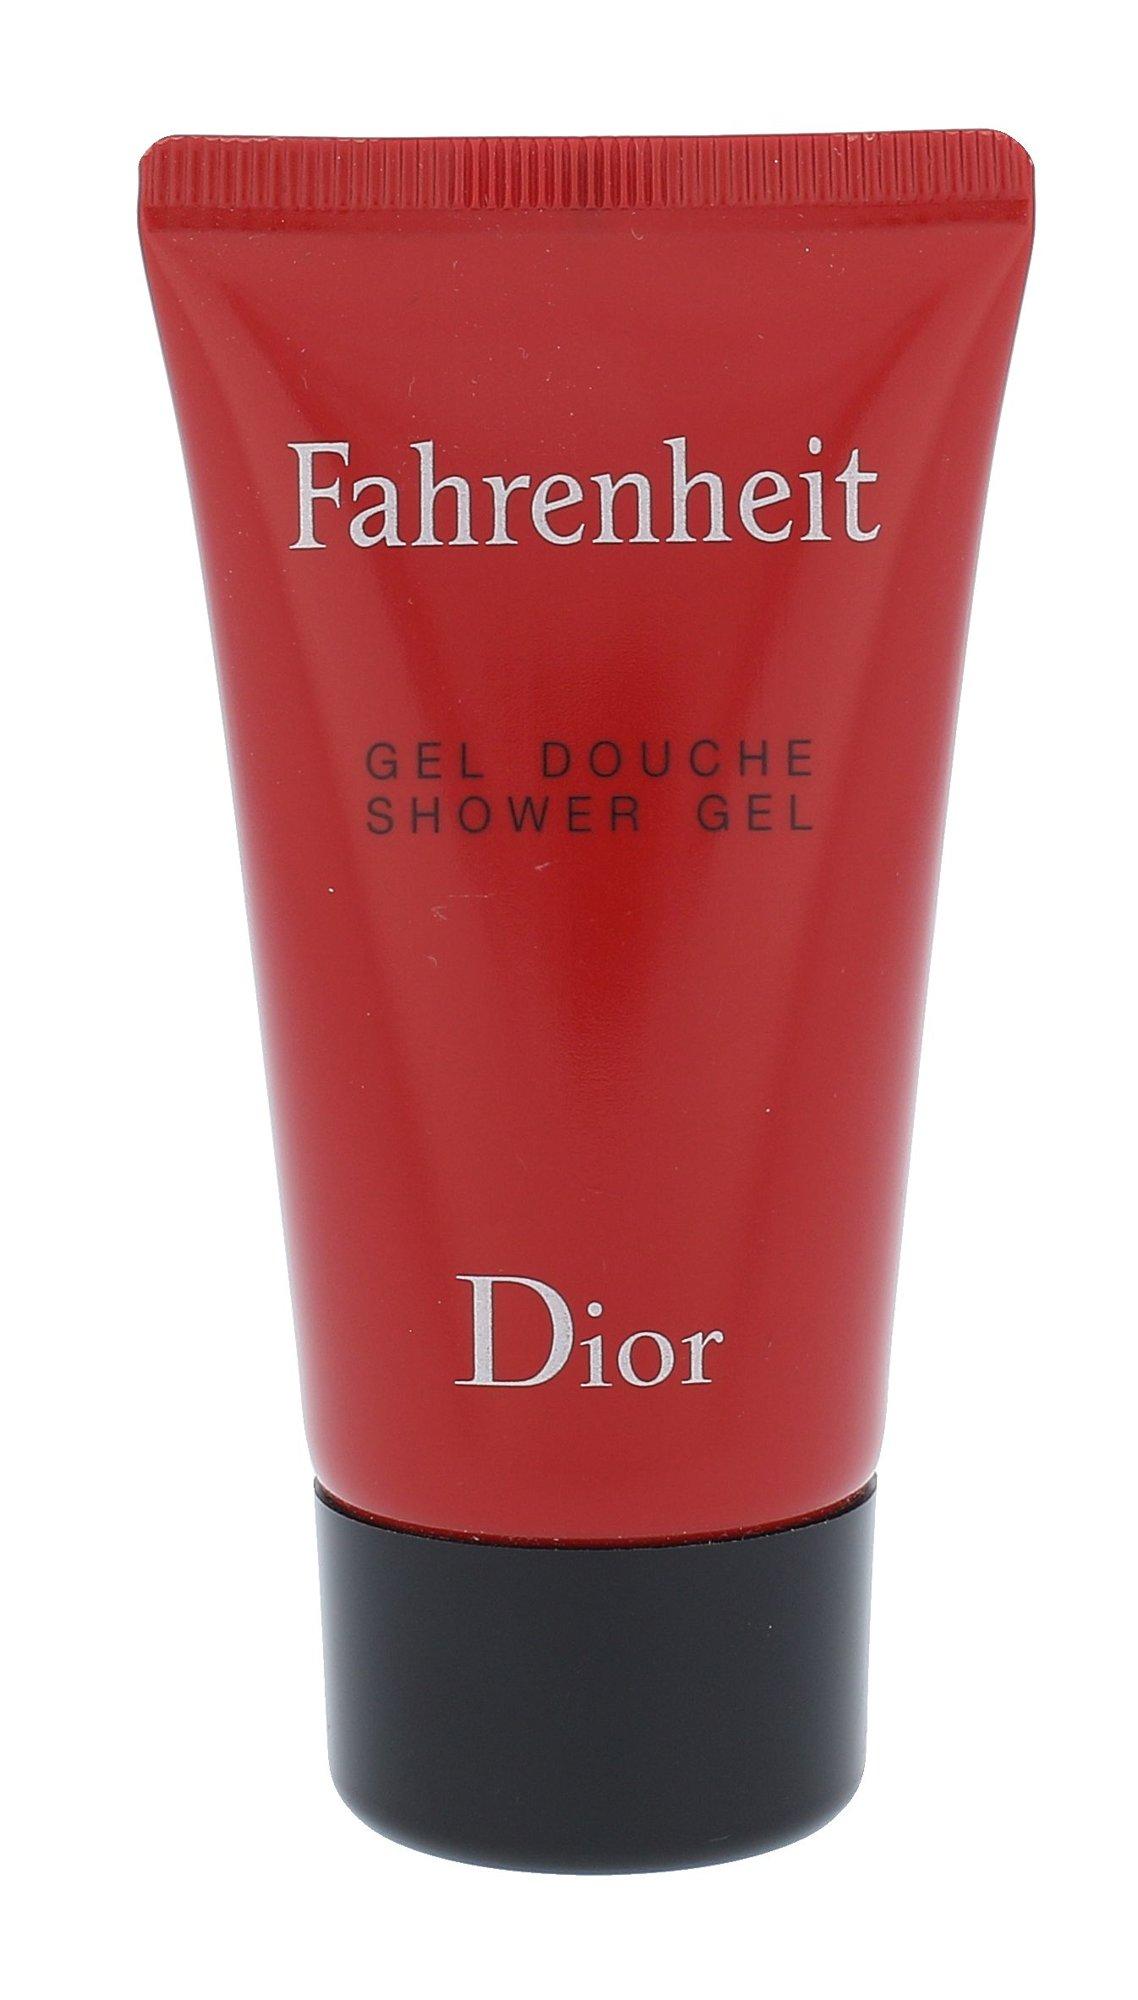 Christian Dior Fahrenheit Shower gel 50ml